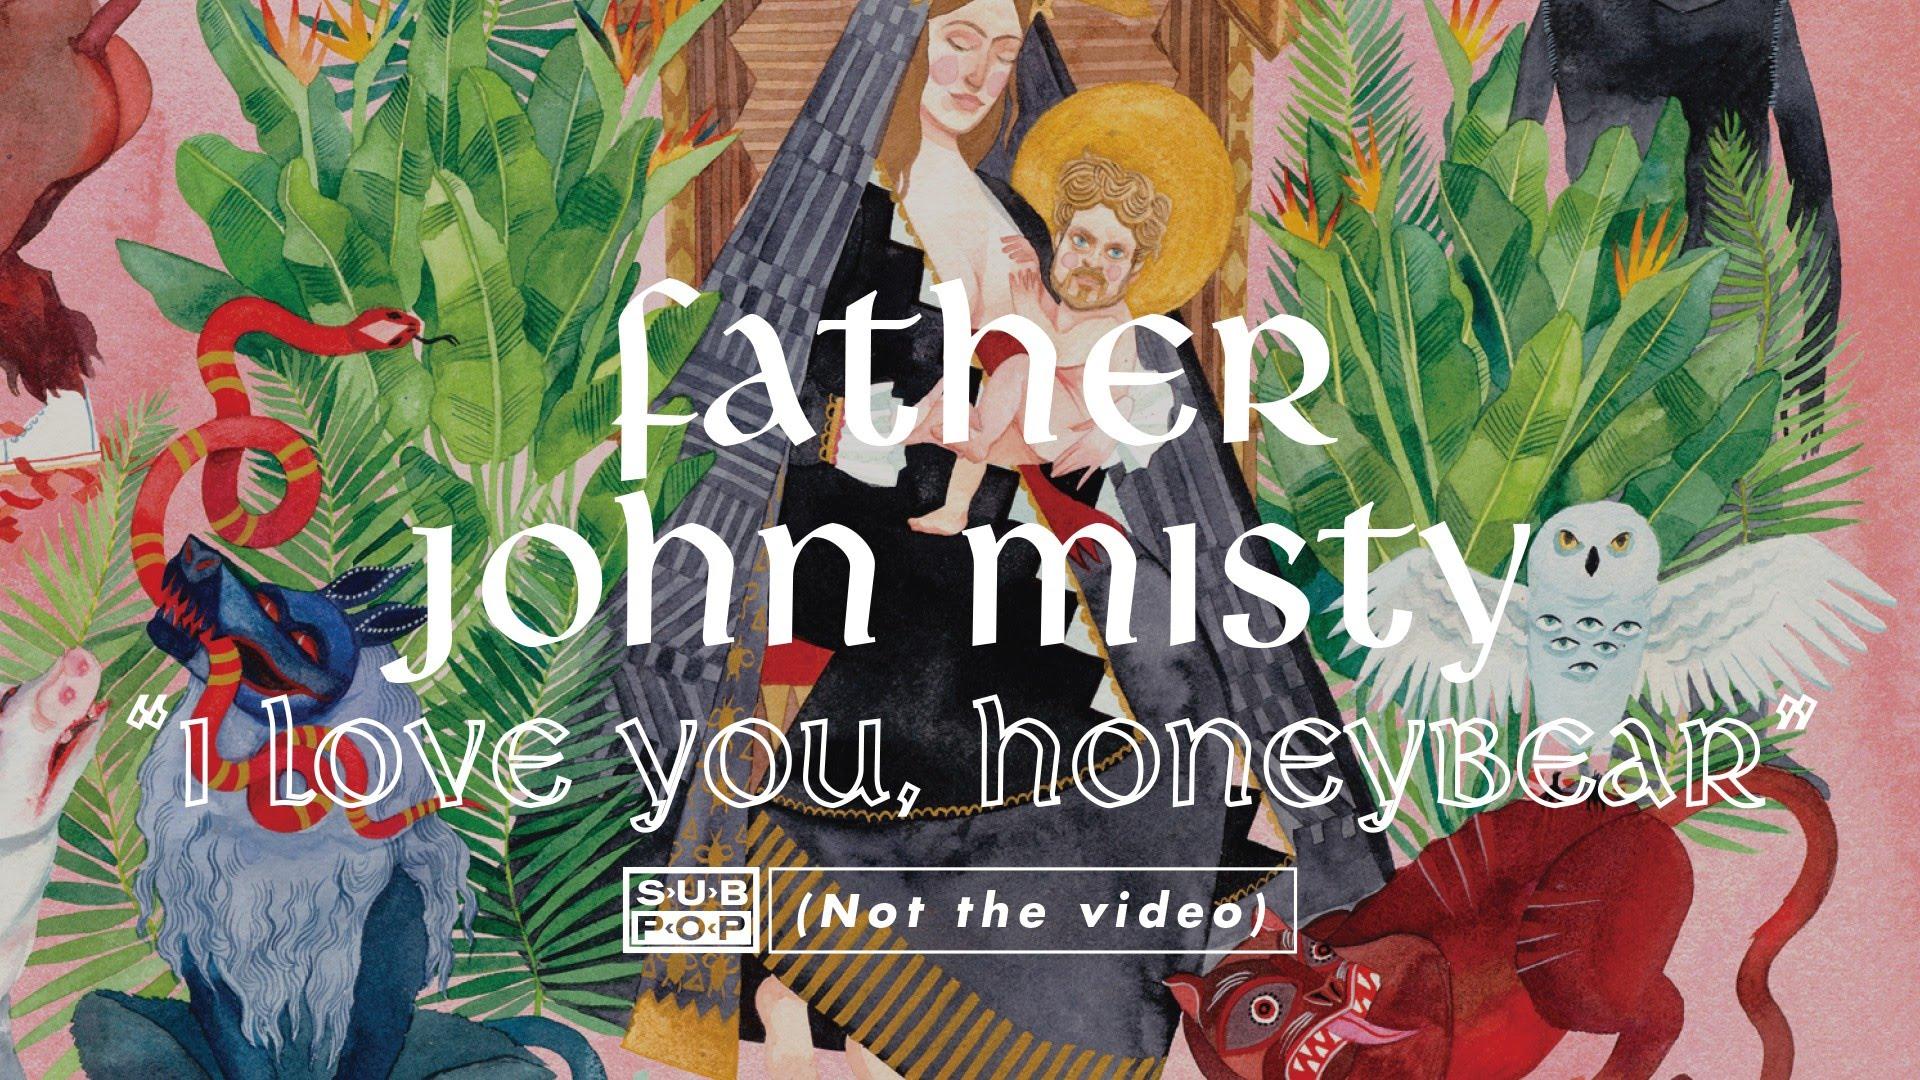 Wallpaper I Love You Honey : Album Review: I Love You, Honeybear by Father John Misty - KRUI Radio